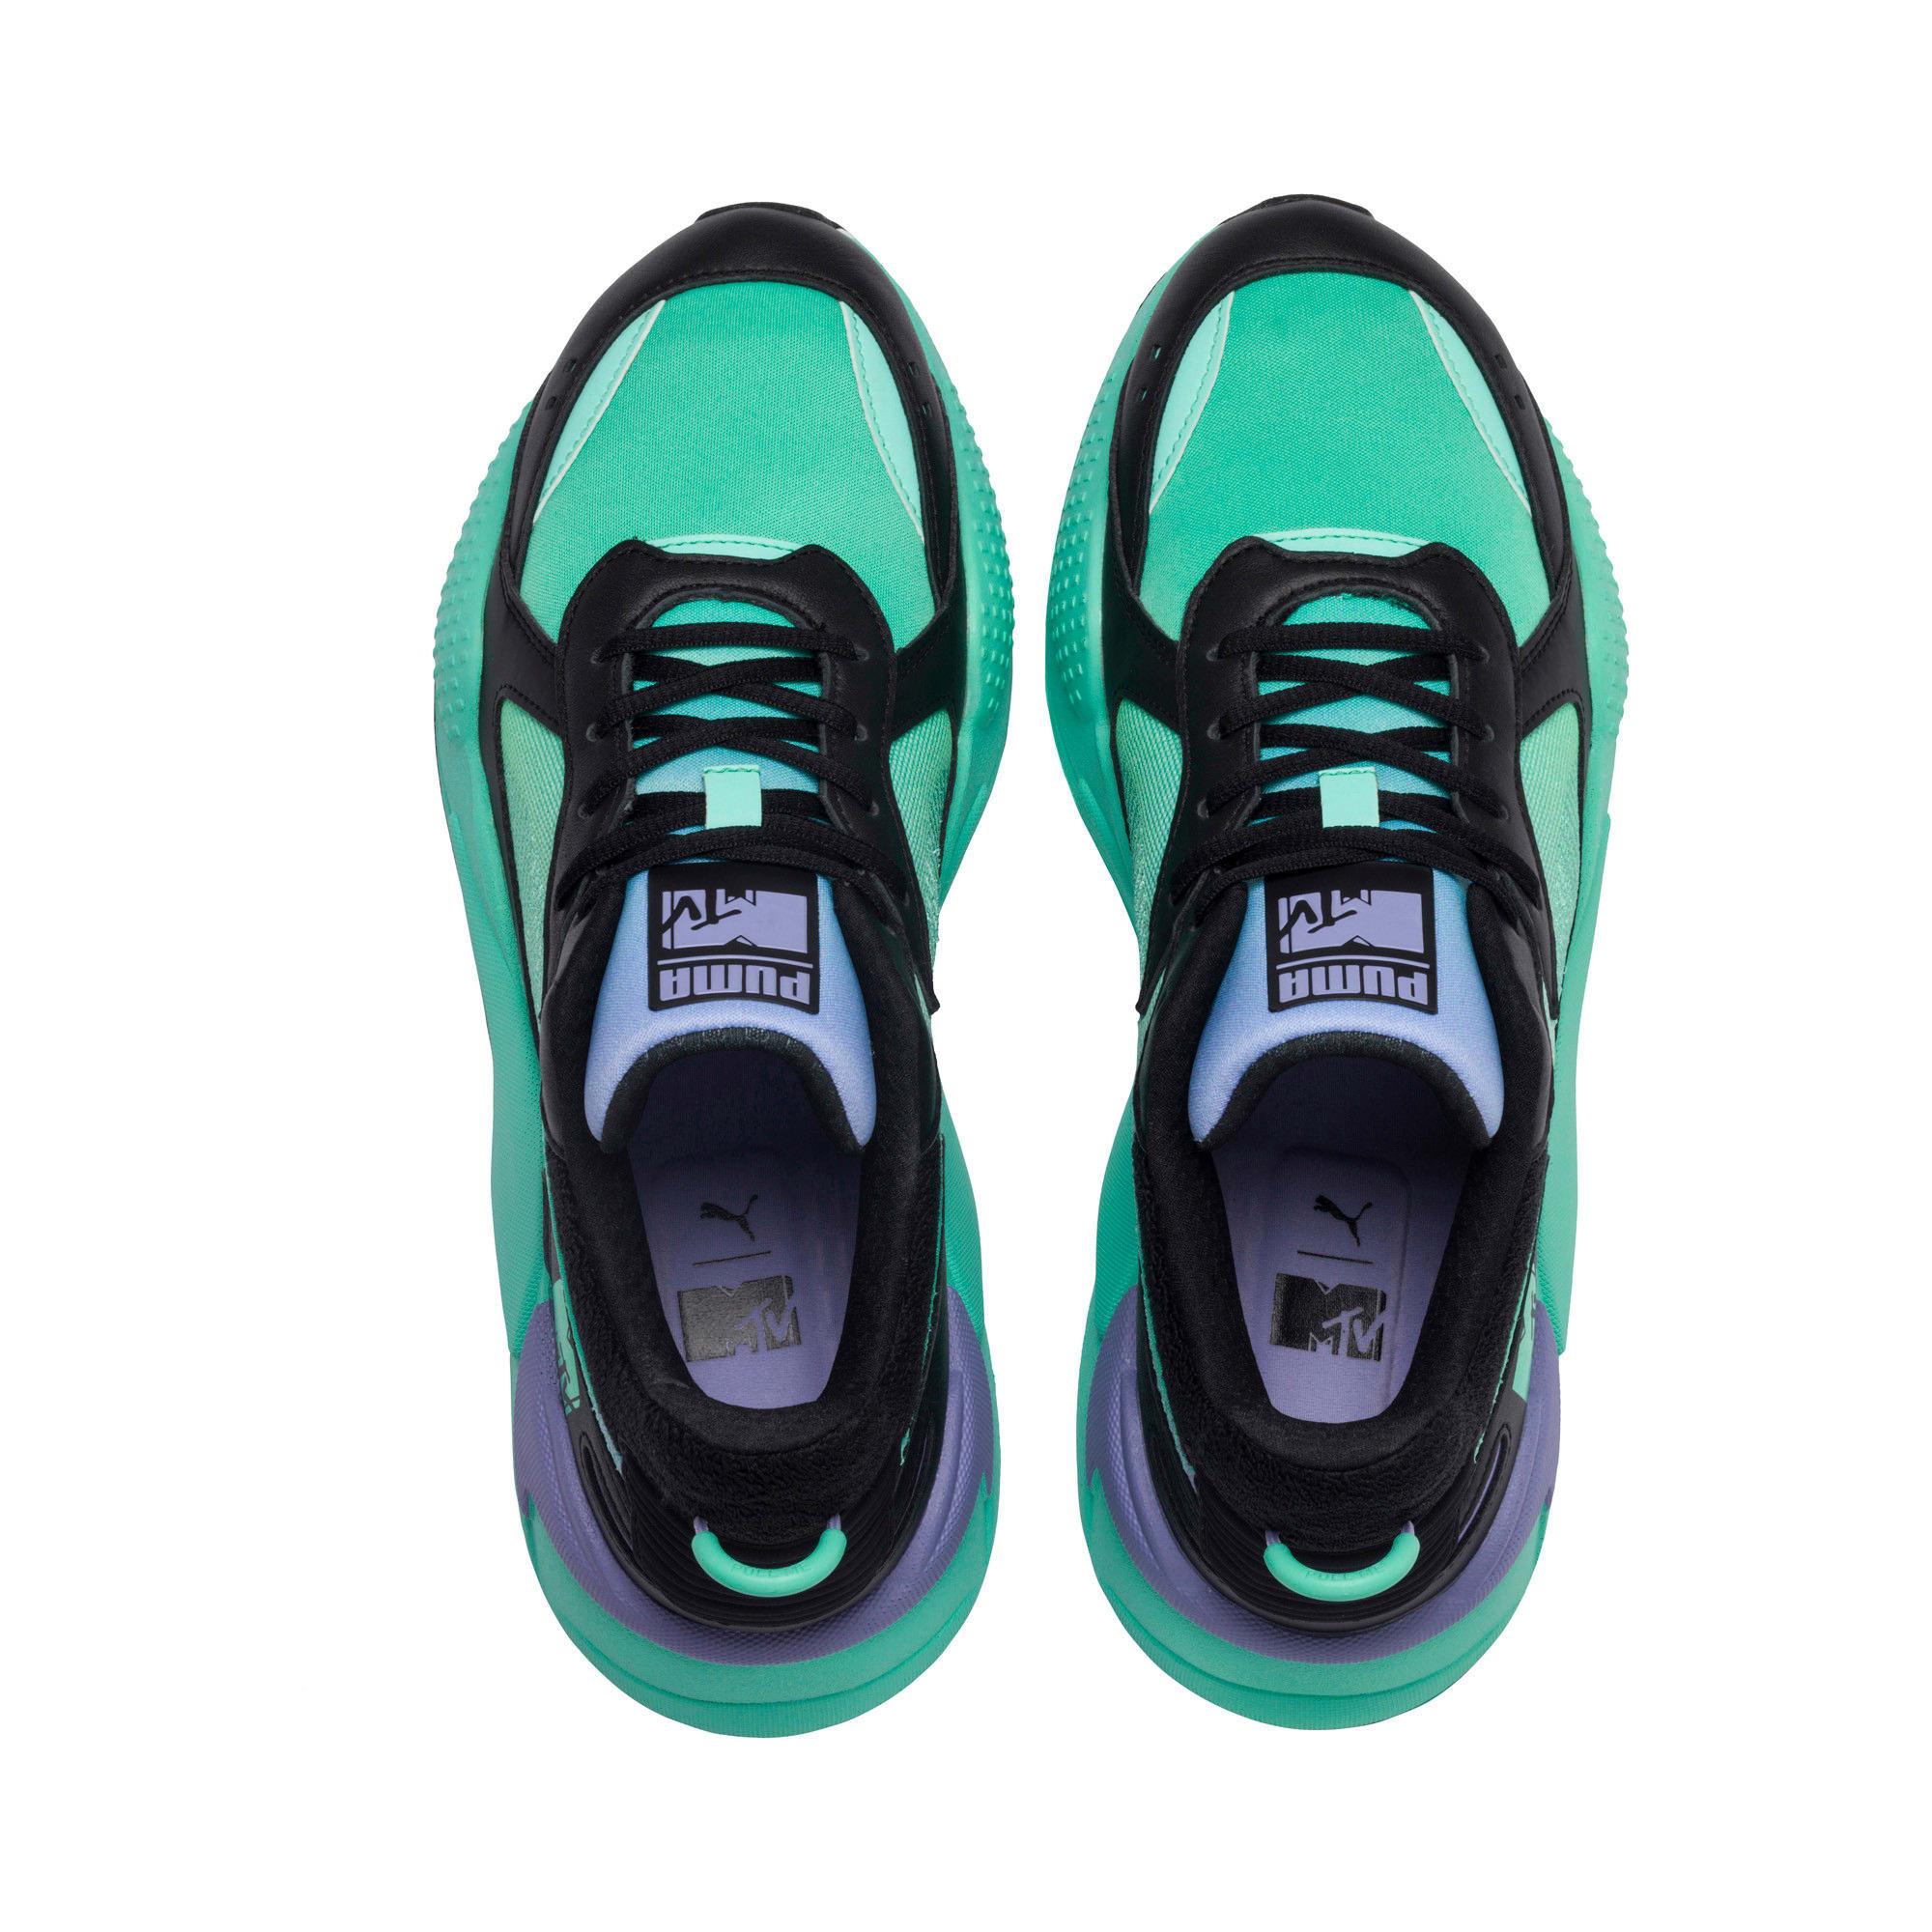 Thumbnail 6 of RS-X Tracks MTV Gradient Gloom Sneakers, Puma Black-Sweet Lavender, medium